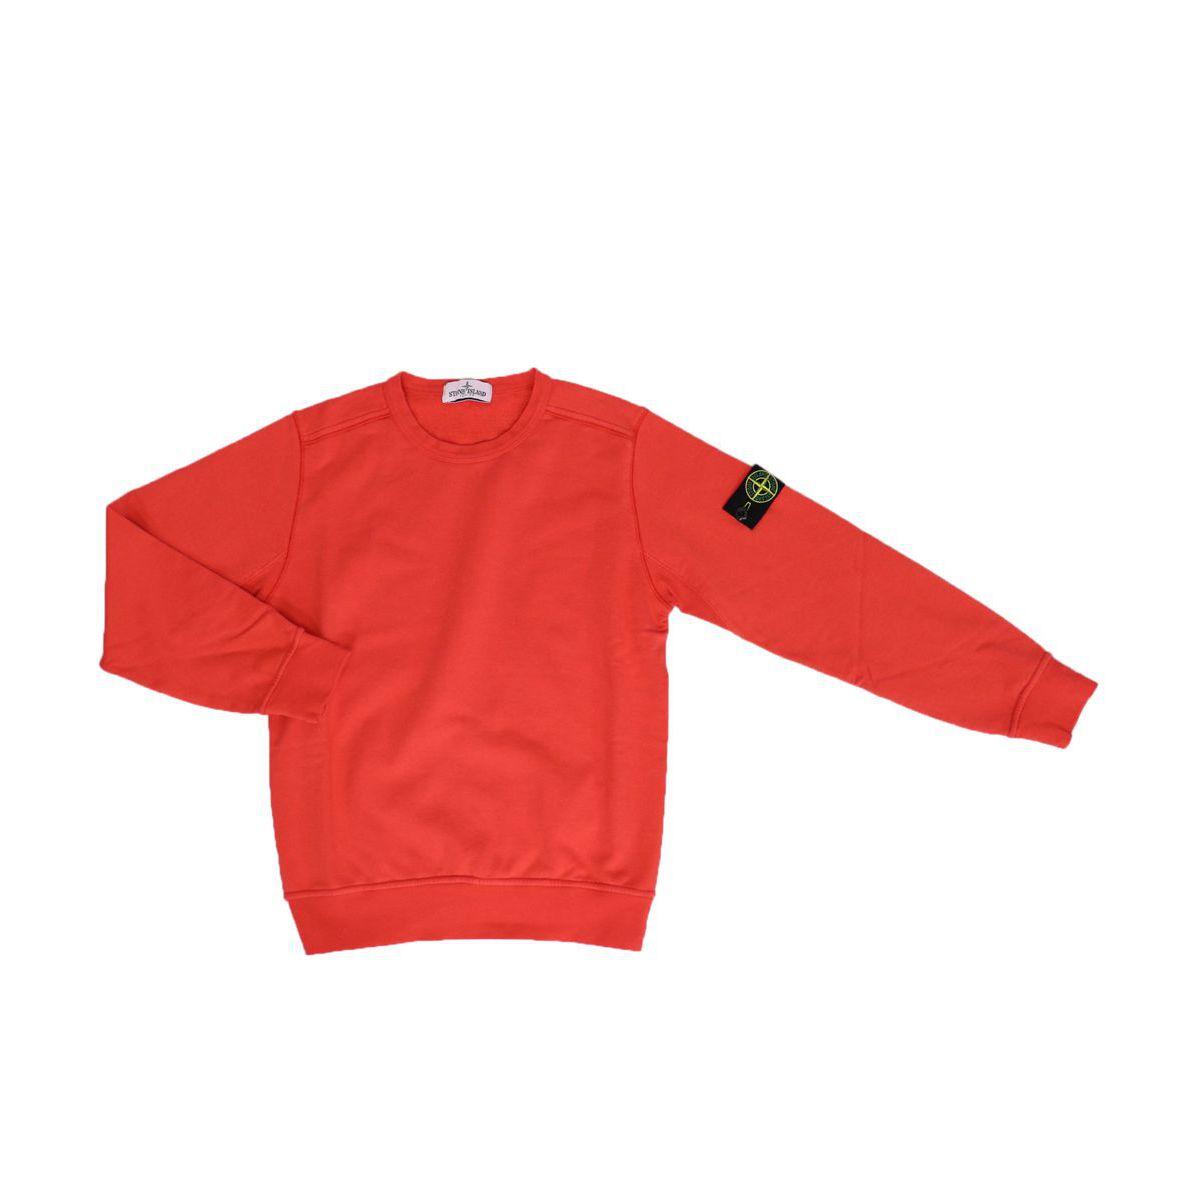 Crewneck cotton sweatshirt with logo patch Coral STONE ISLAND JUNIOR